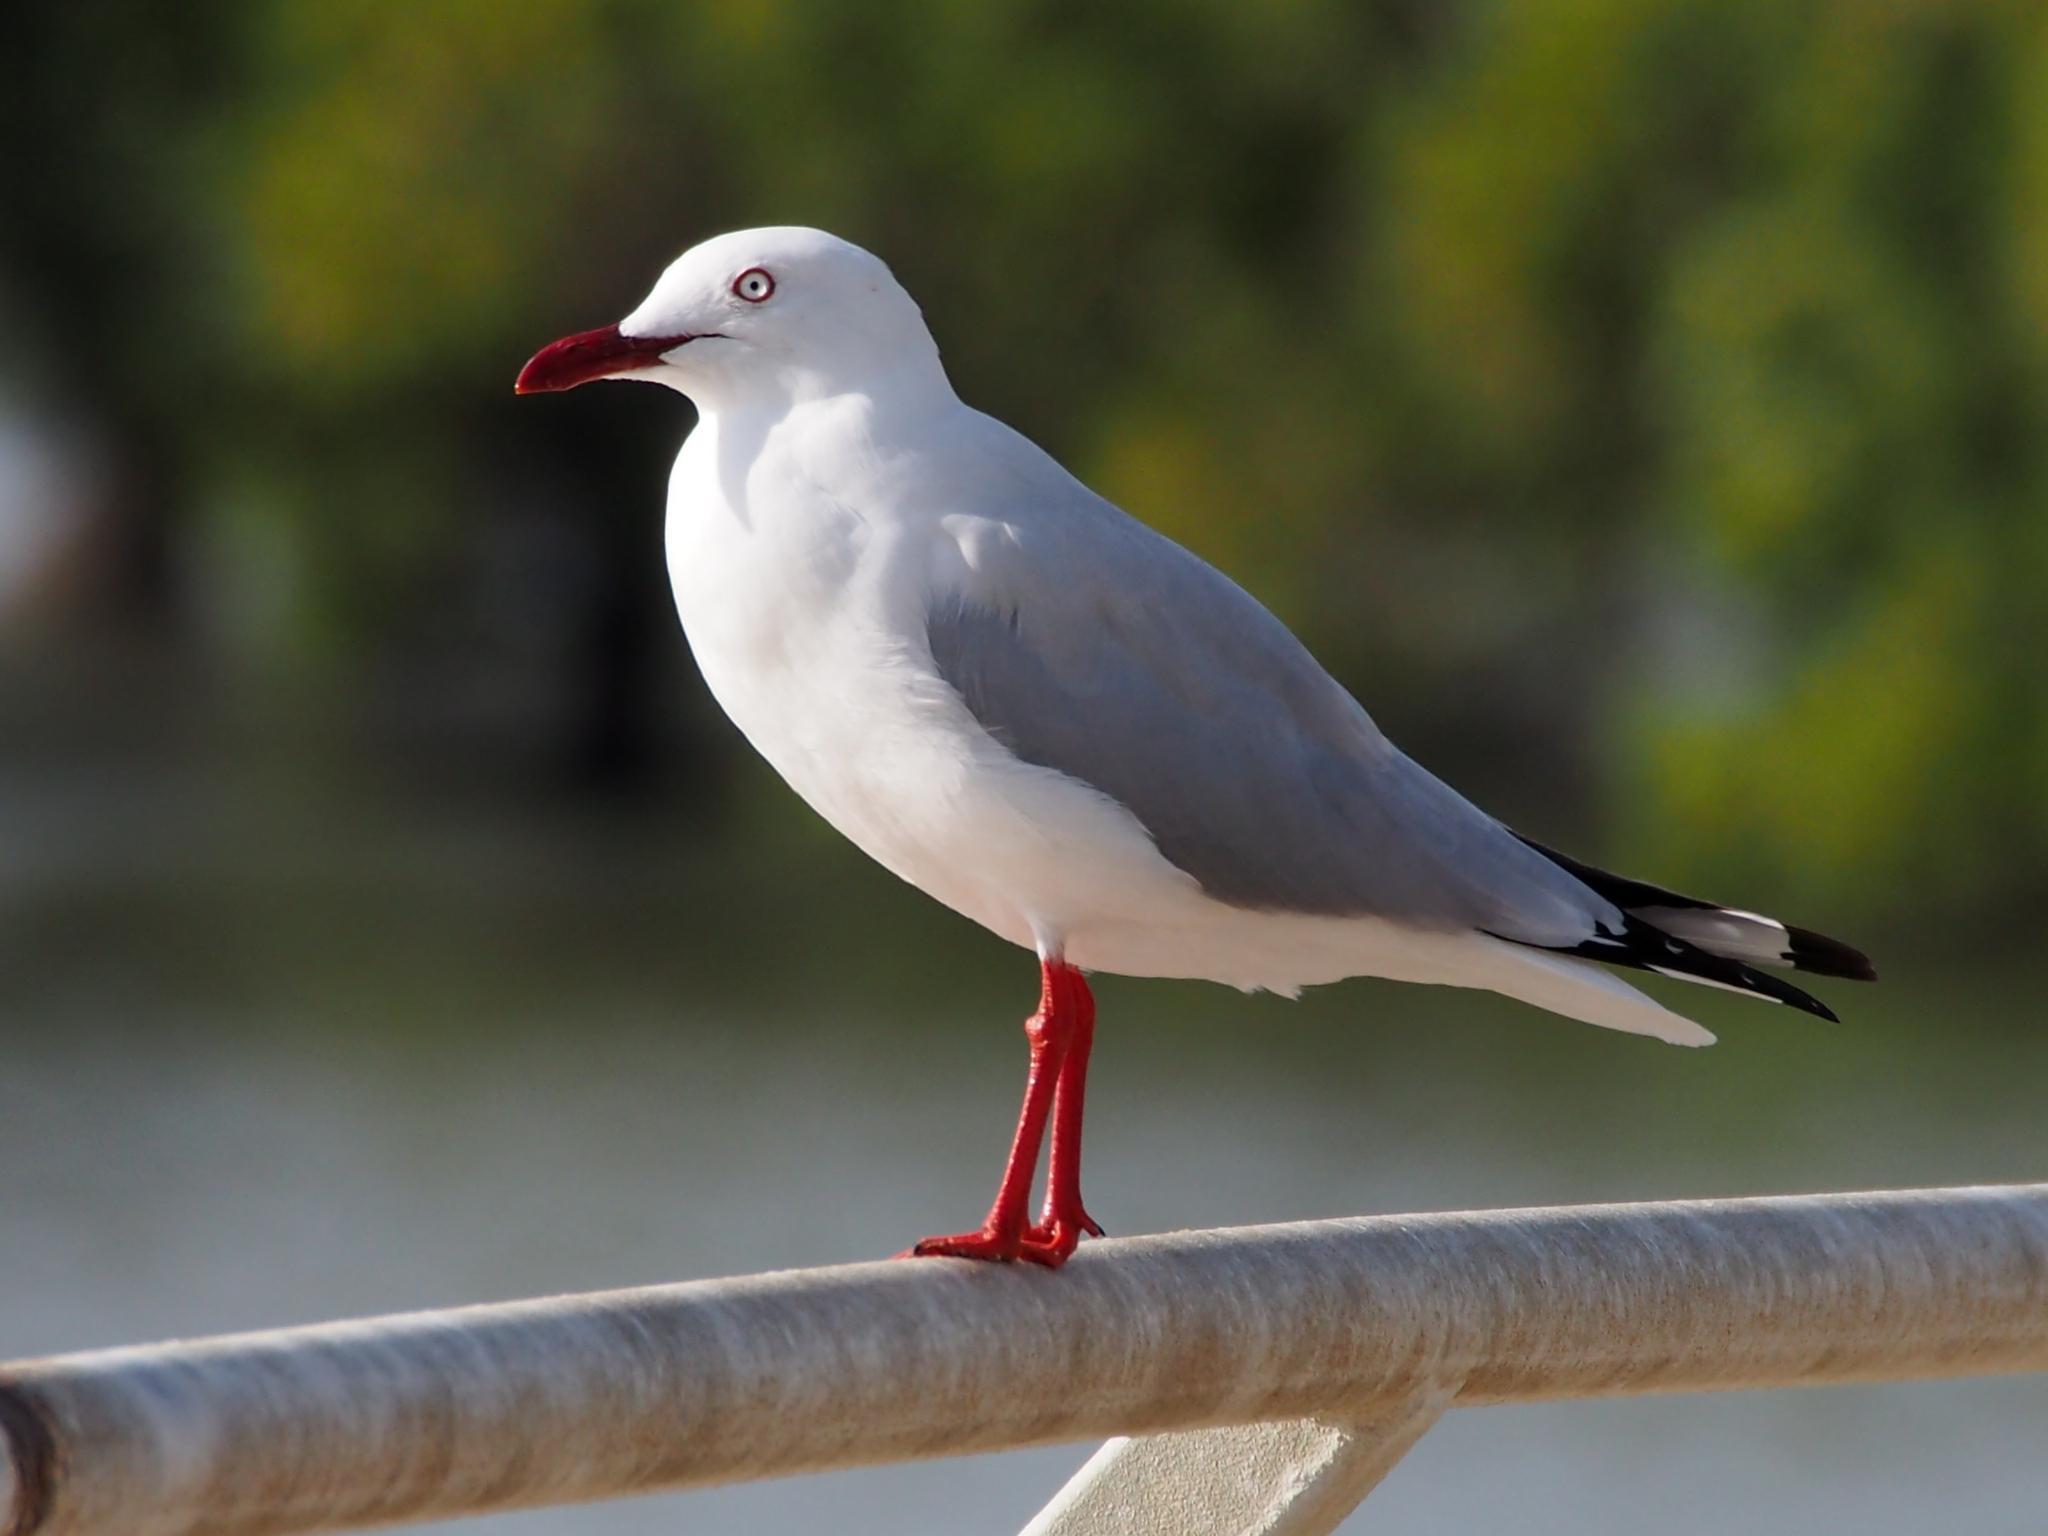 Seagull by Kim McGlinchey